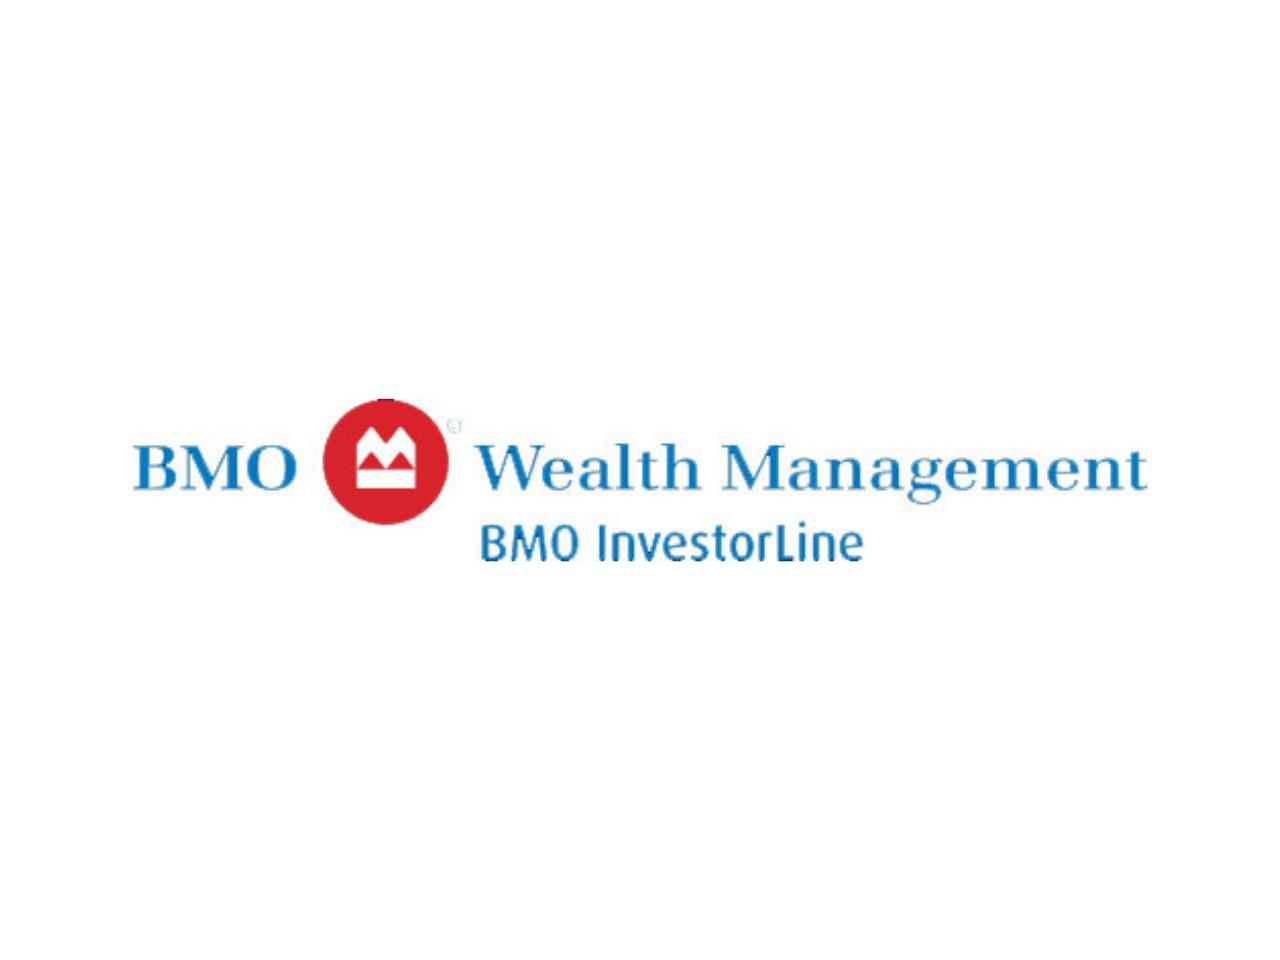 BMO InvestorLine Review